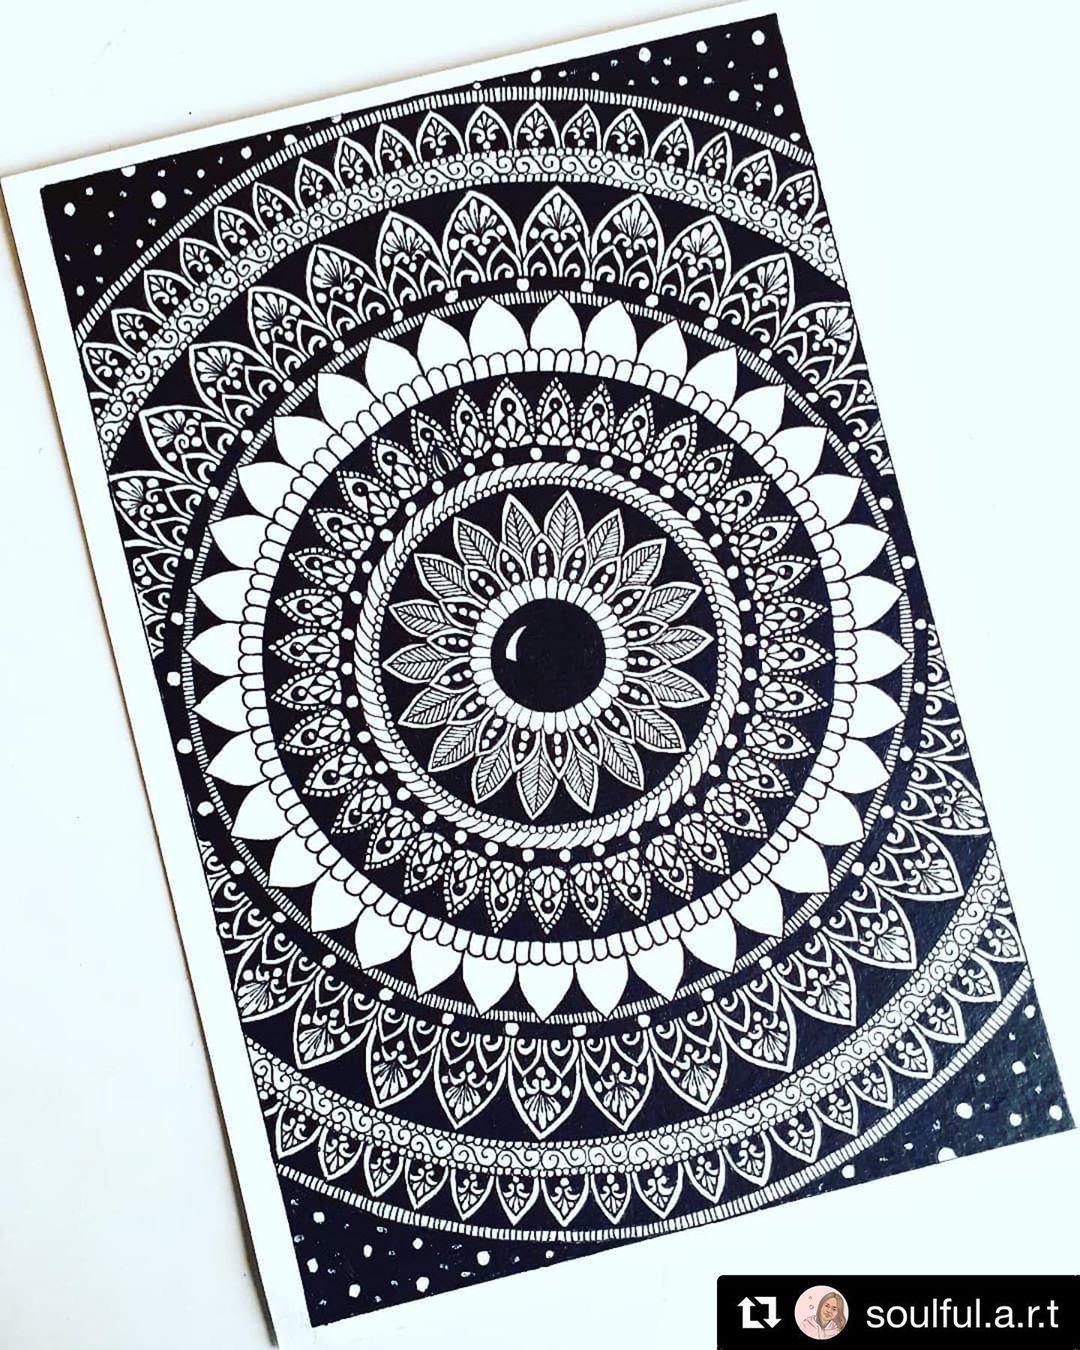 Pin By Love Sugar On Mandala Drawing In 2020 Mandala Art Lesson Mandala Design Art Mandala Art